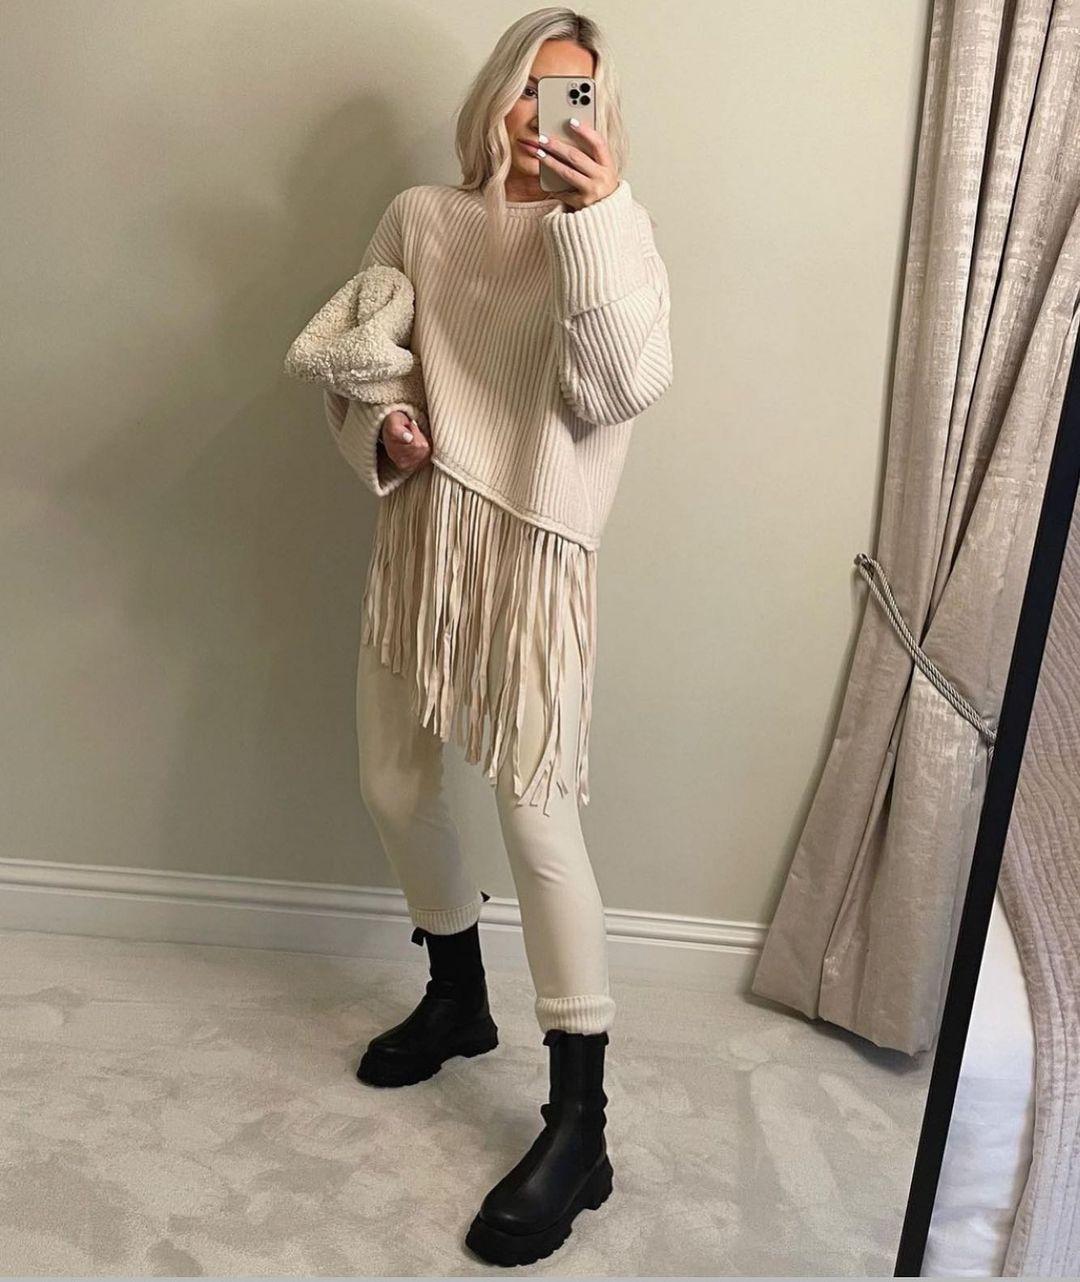 oversized fringed sweater de Zara sur zara.style.daily